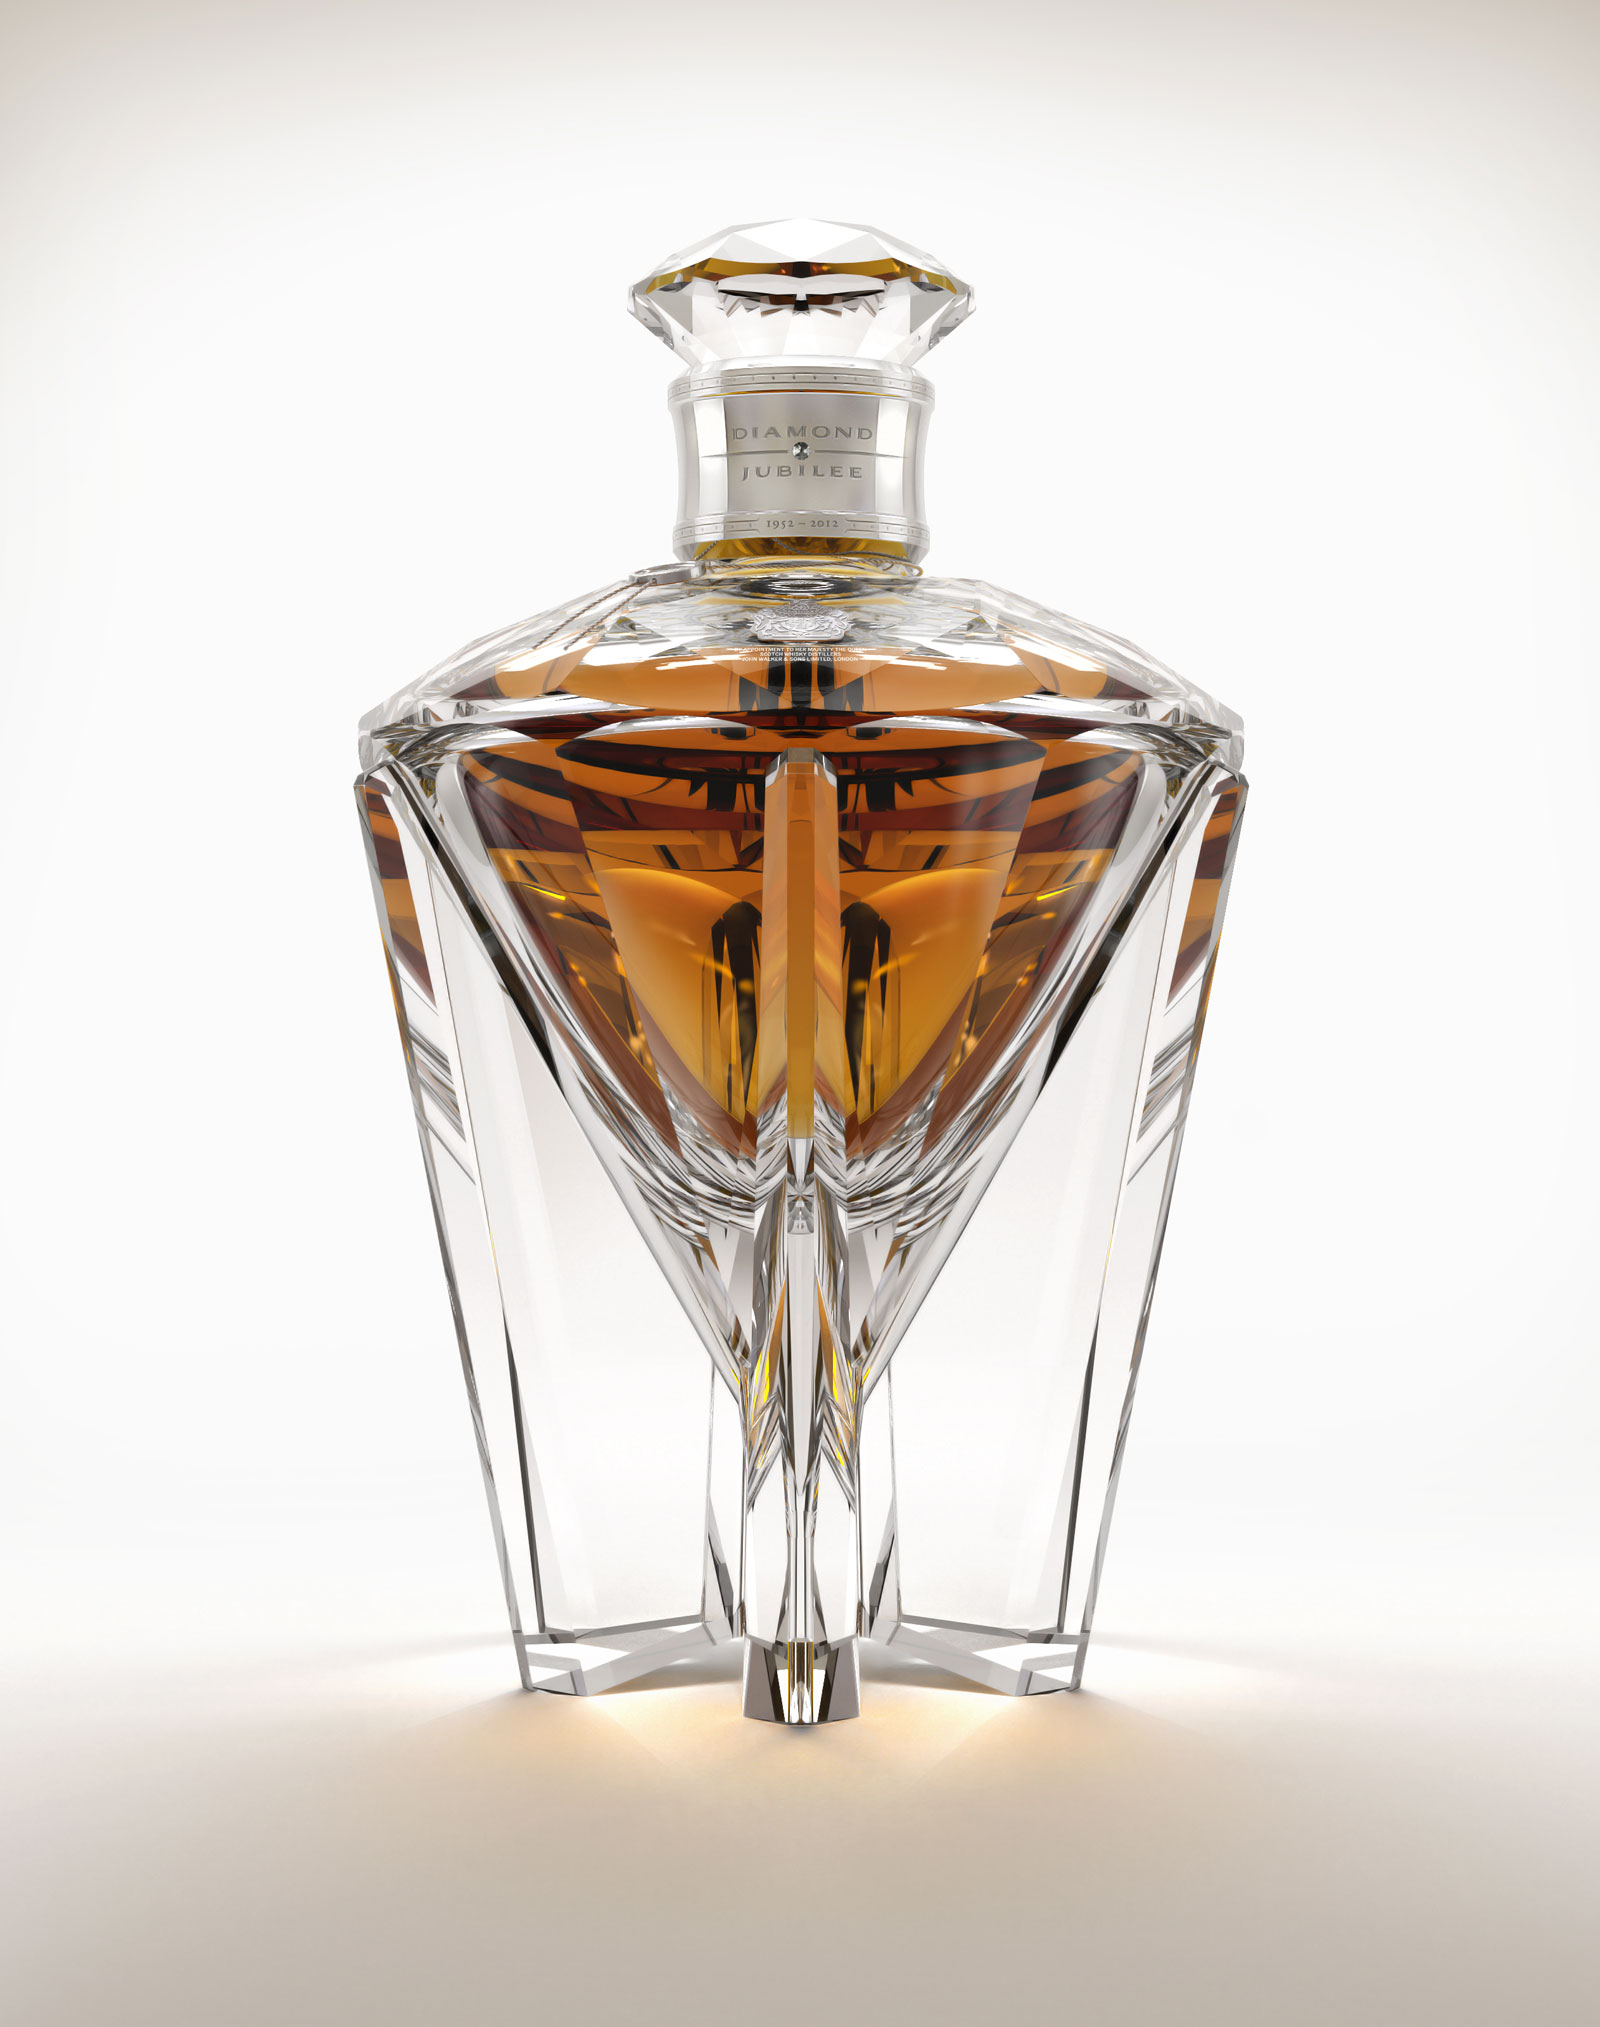 Diamond Jubilee blended Scotch Whisky by John Walker & Sons